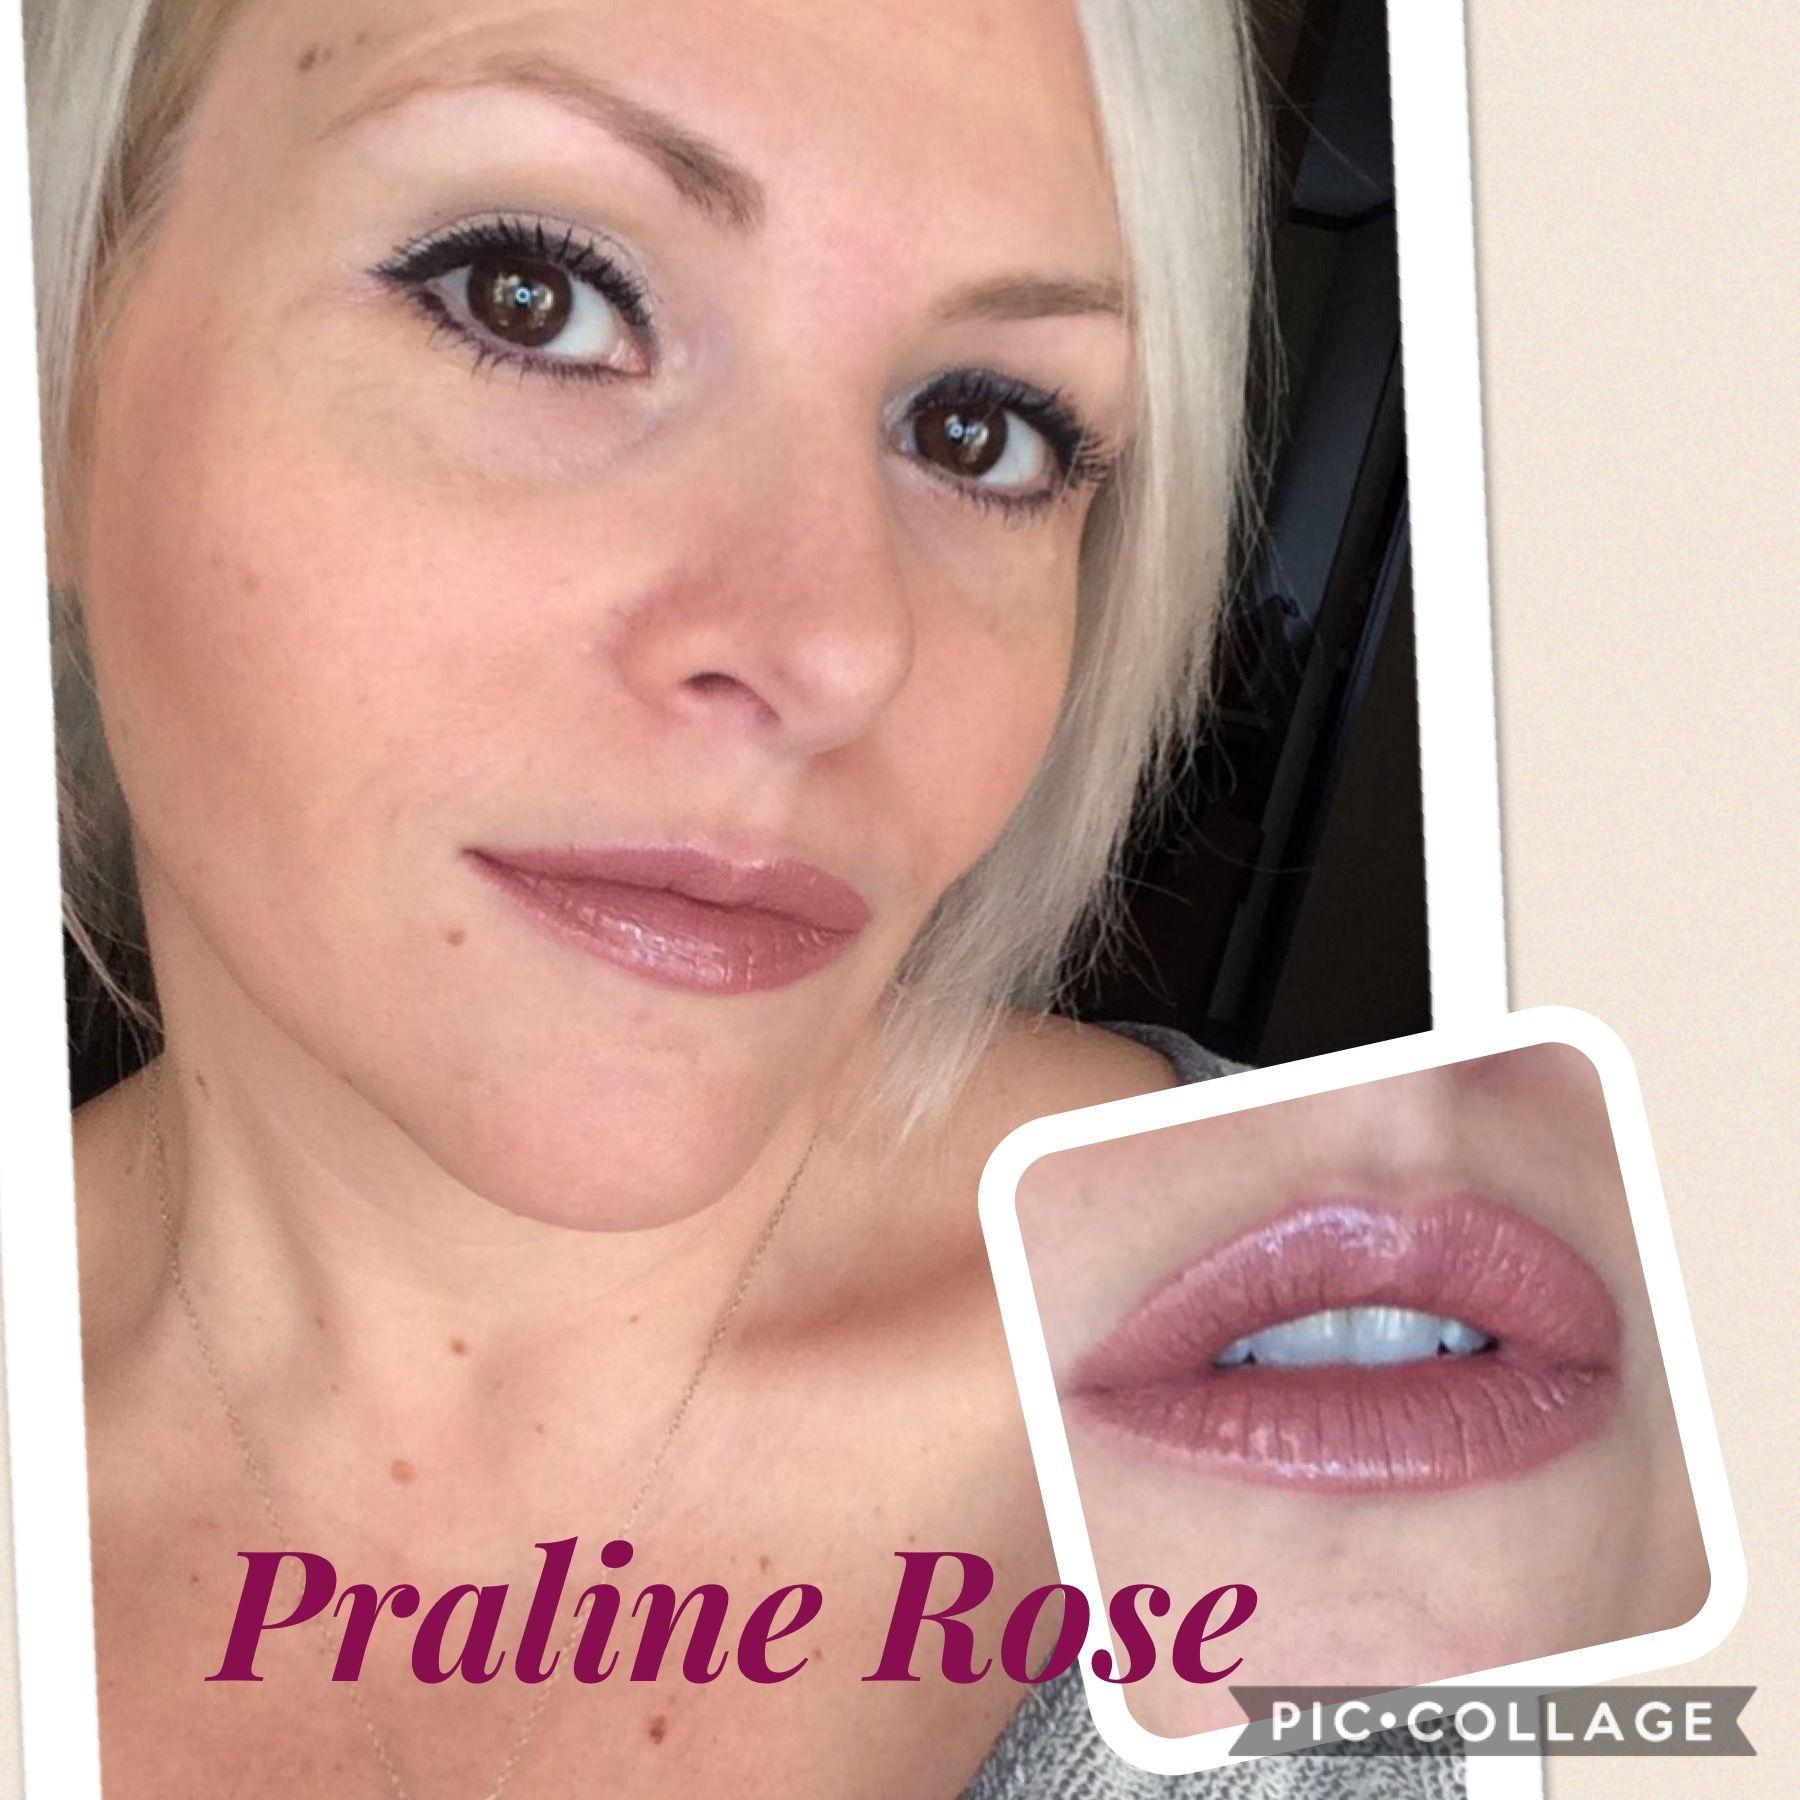 Lipsense Praline Rose Slubne Suknieinfo